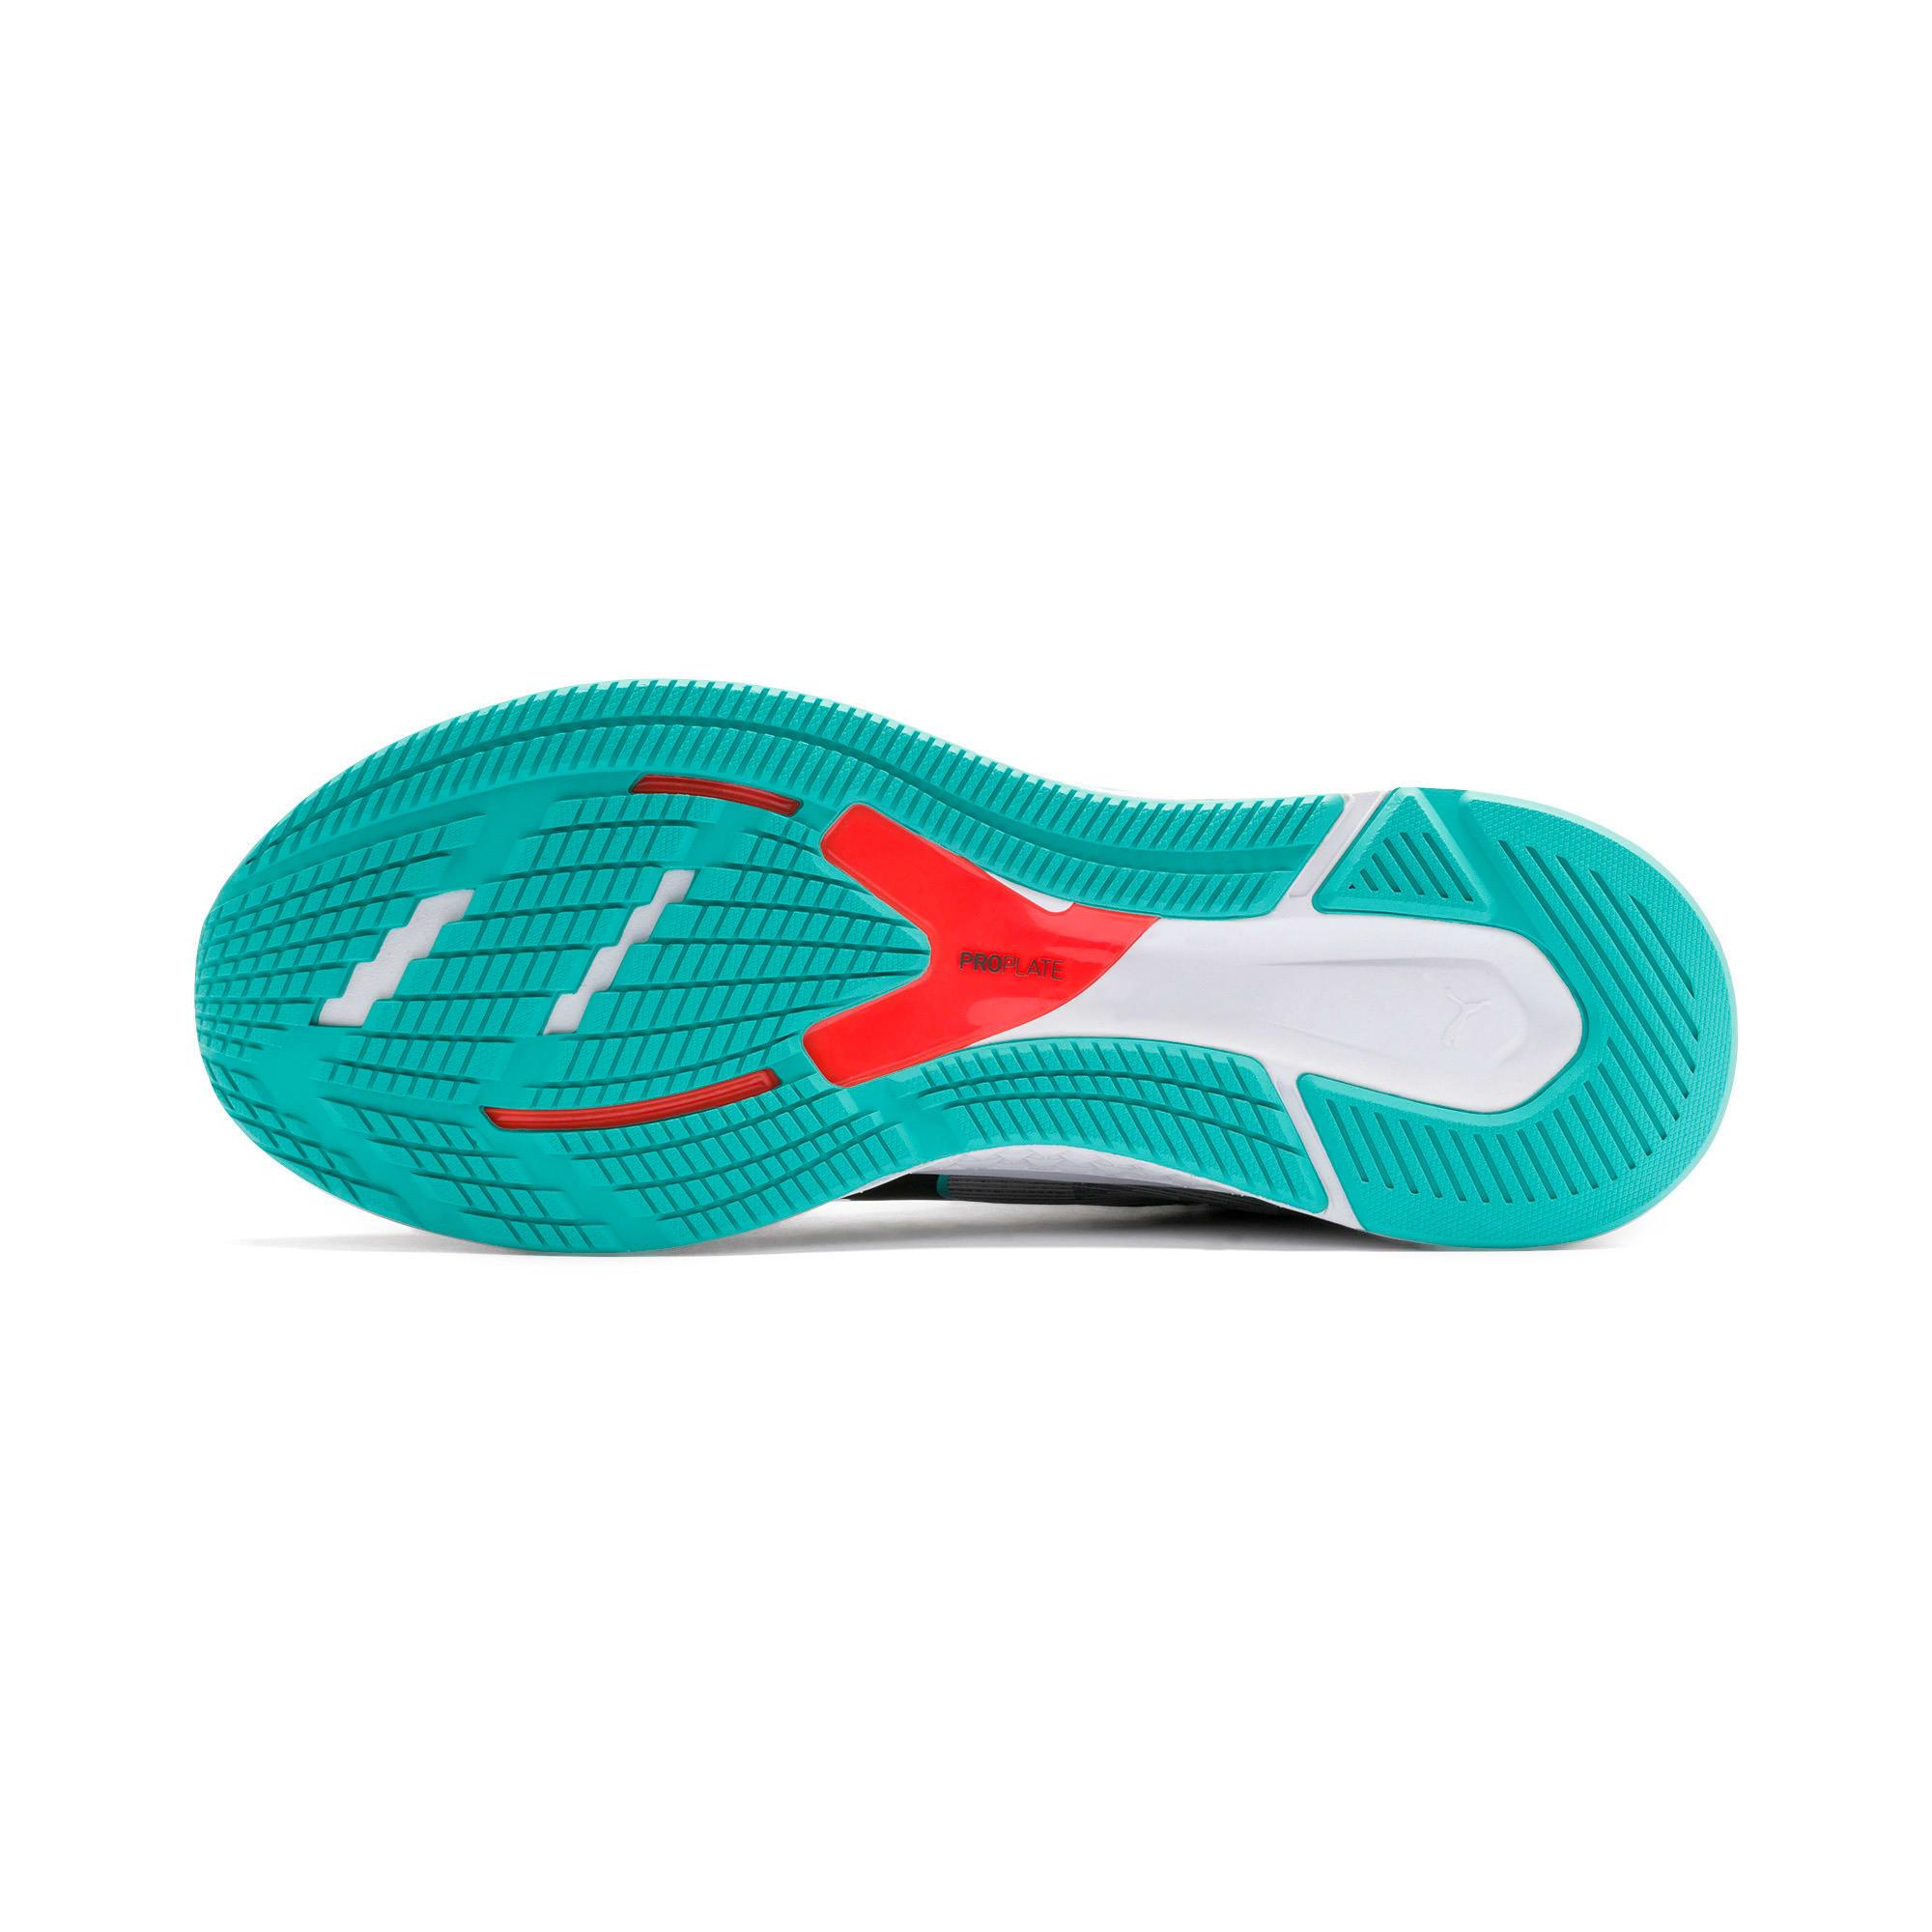 Thumbnail 5 of SPEED Sutamina Running Shoes, High Rise-Nrgy Red-Blue Turq, medium